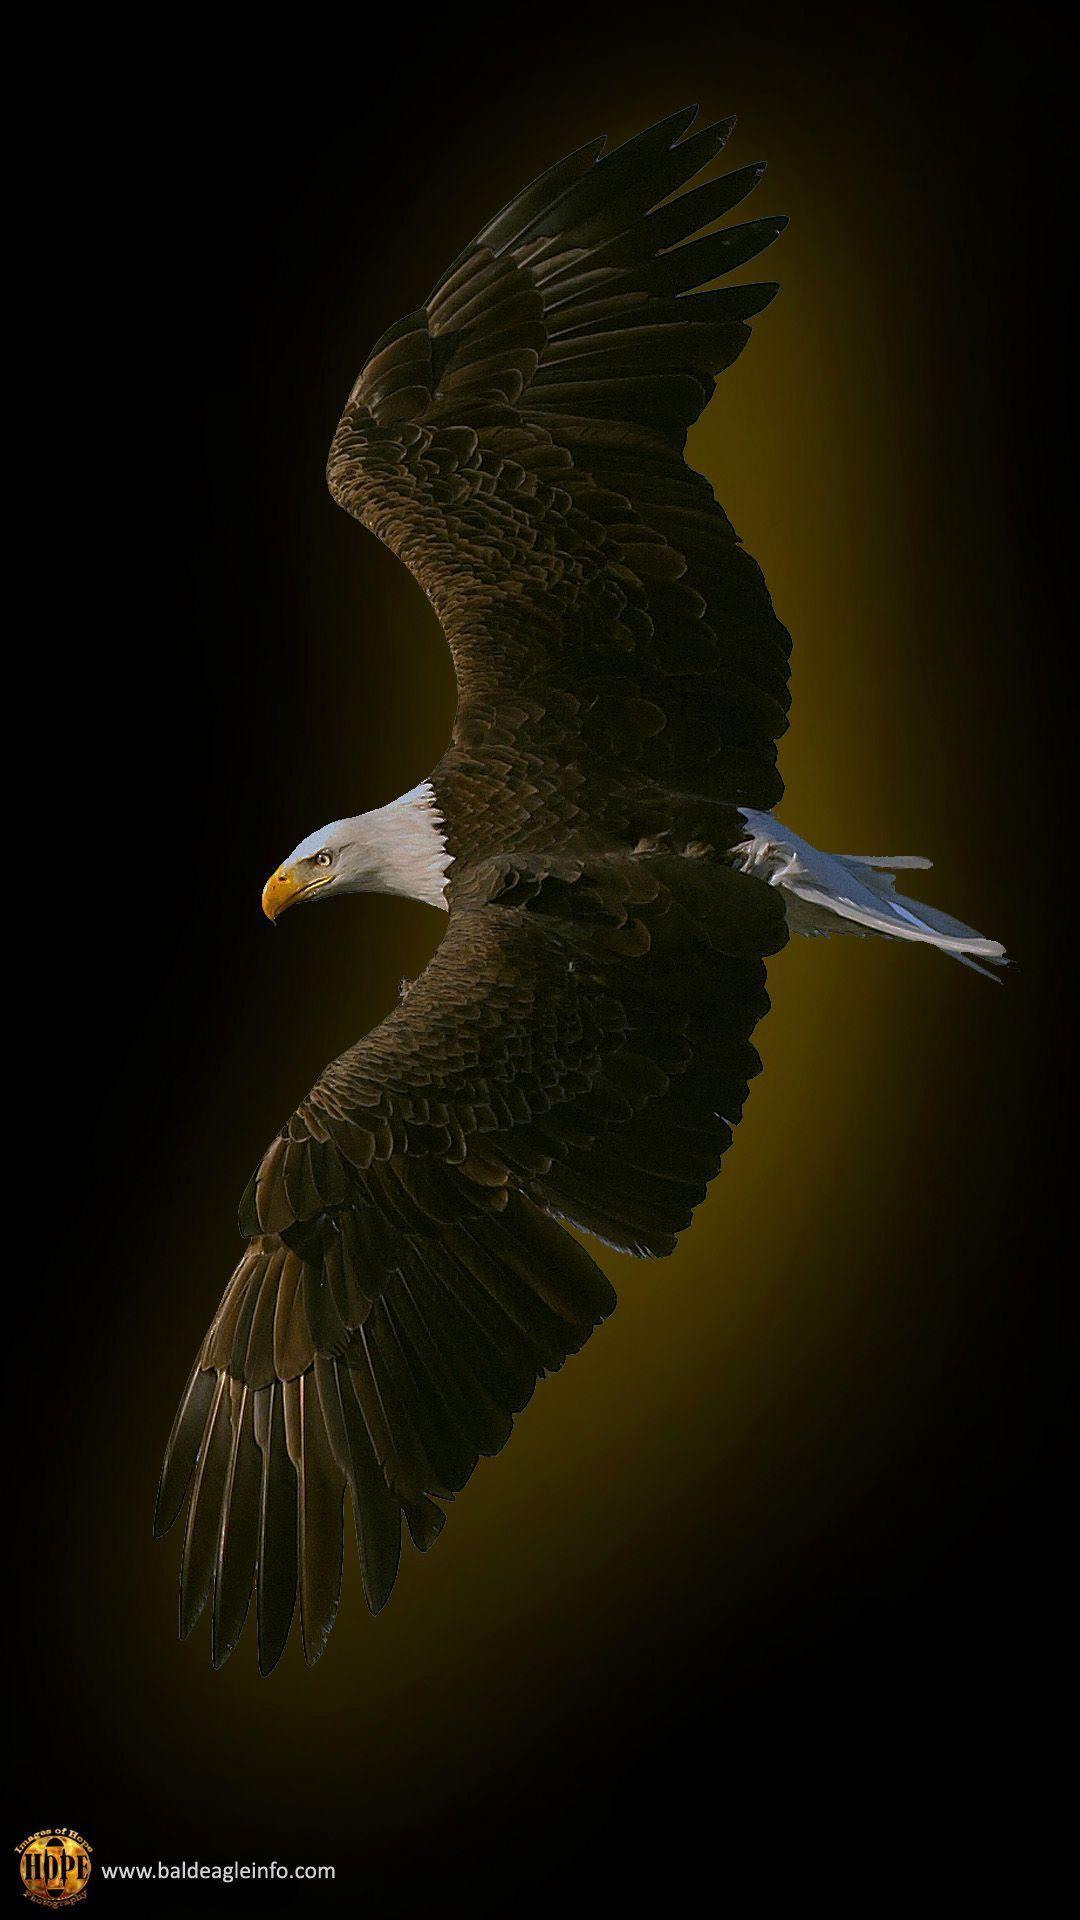 Aesthetic Animal Wallpaper Download Free Hd Wallpapers Lockscreens Eagle Wallpaper Animal Wallpaper Bald Eagle Eagle bird full hd wallpapers